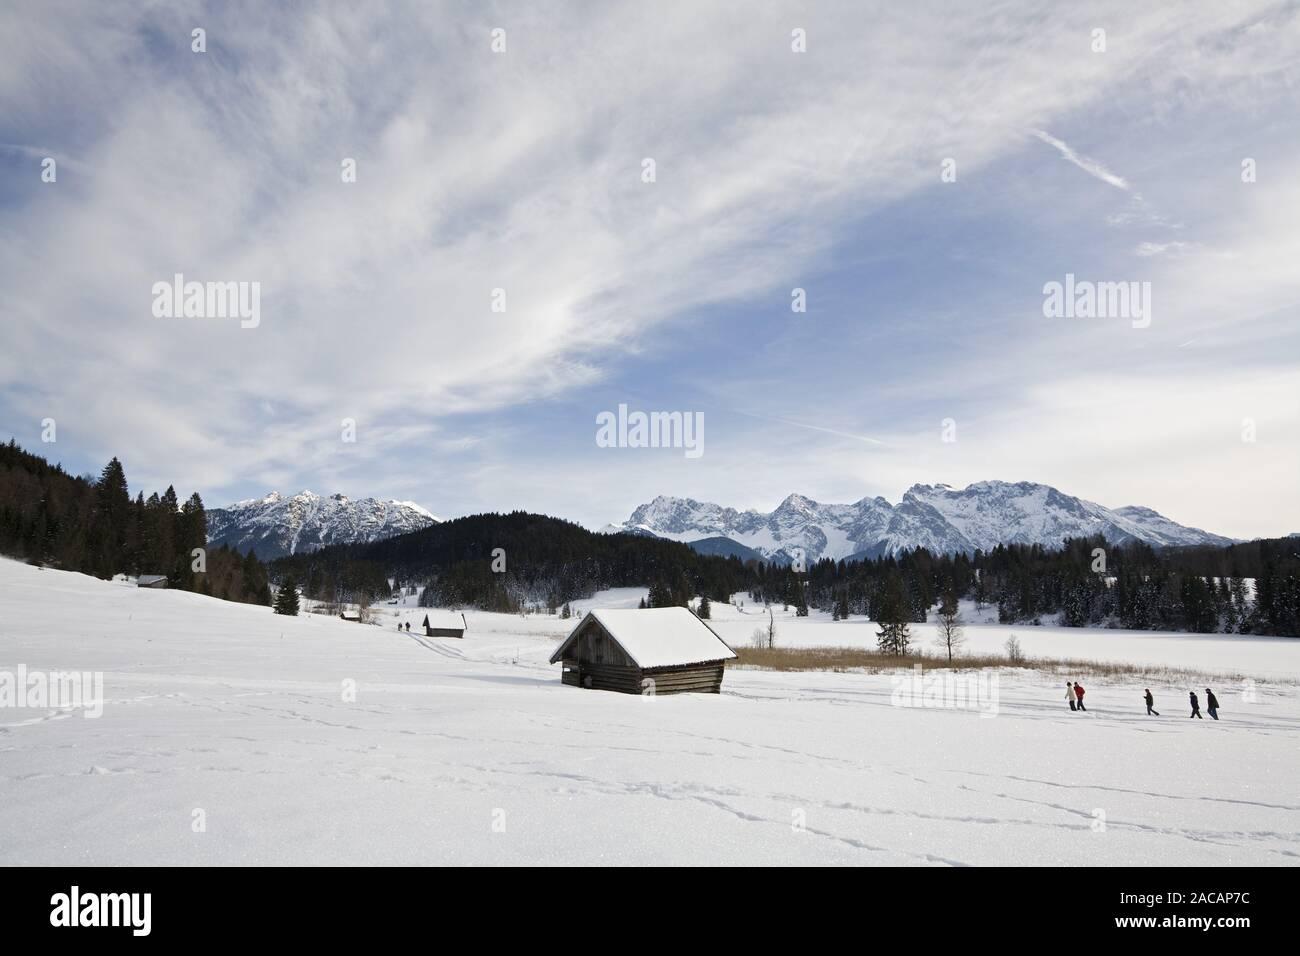 Walker and hut at the Geroldsee with Karwendelgebirge, Bavarian Alps, Upper Bavaria, Bavaria, Germany, Europe, walker at lake ge Stock Photo